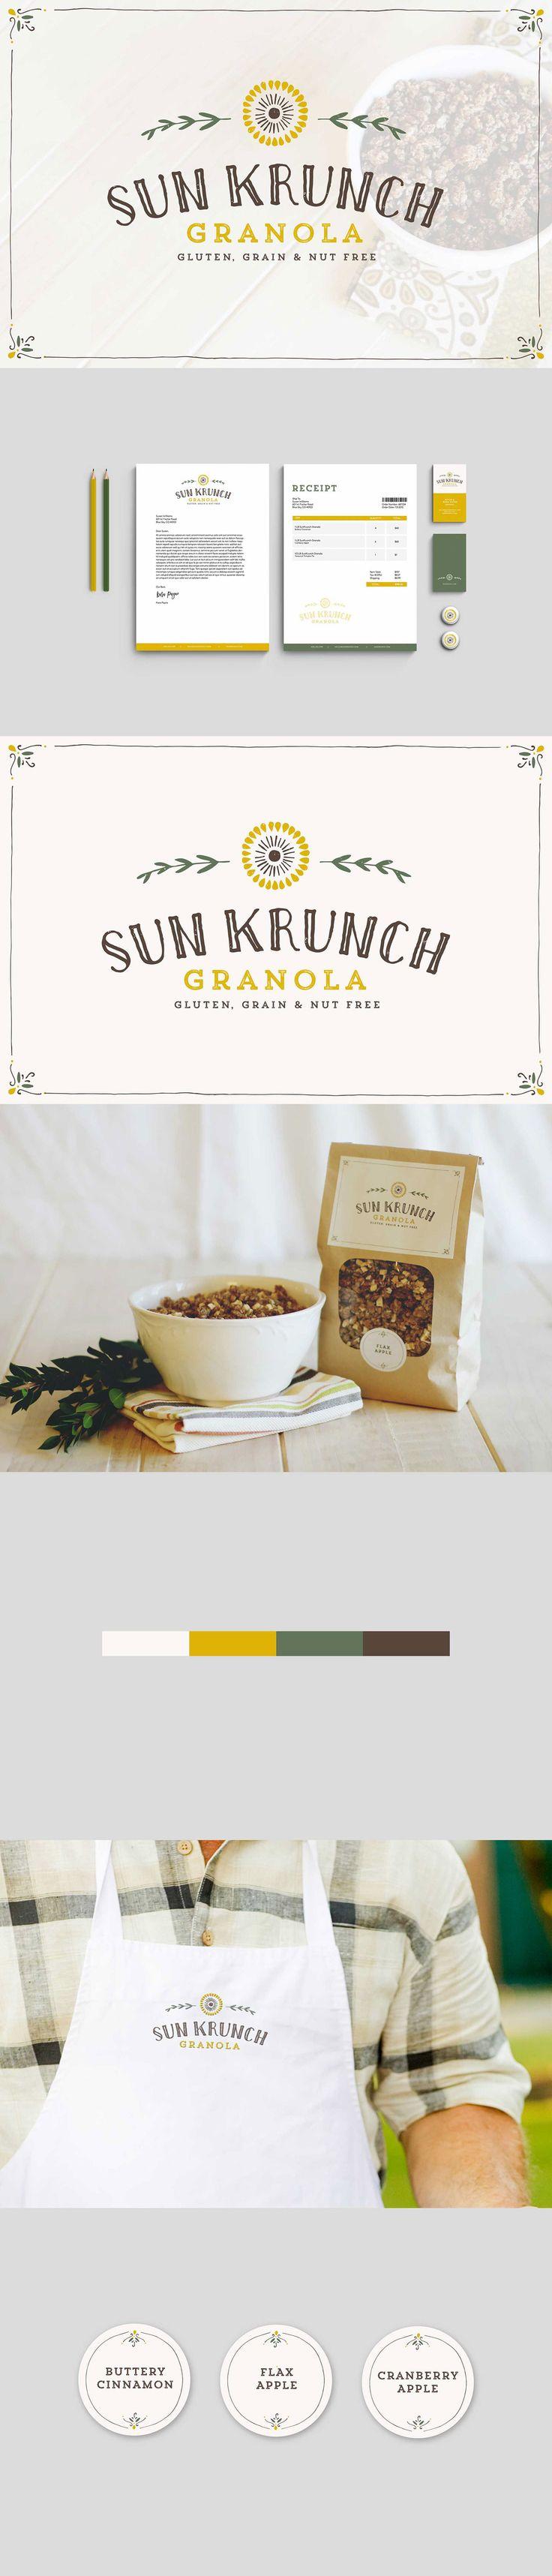 Sun Krunch Granola branding by Kristen Williams on Behance \\ Gluten, Grain and Nut Free, Paleo Granola